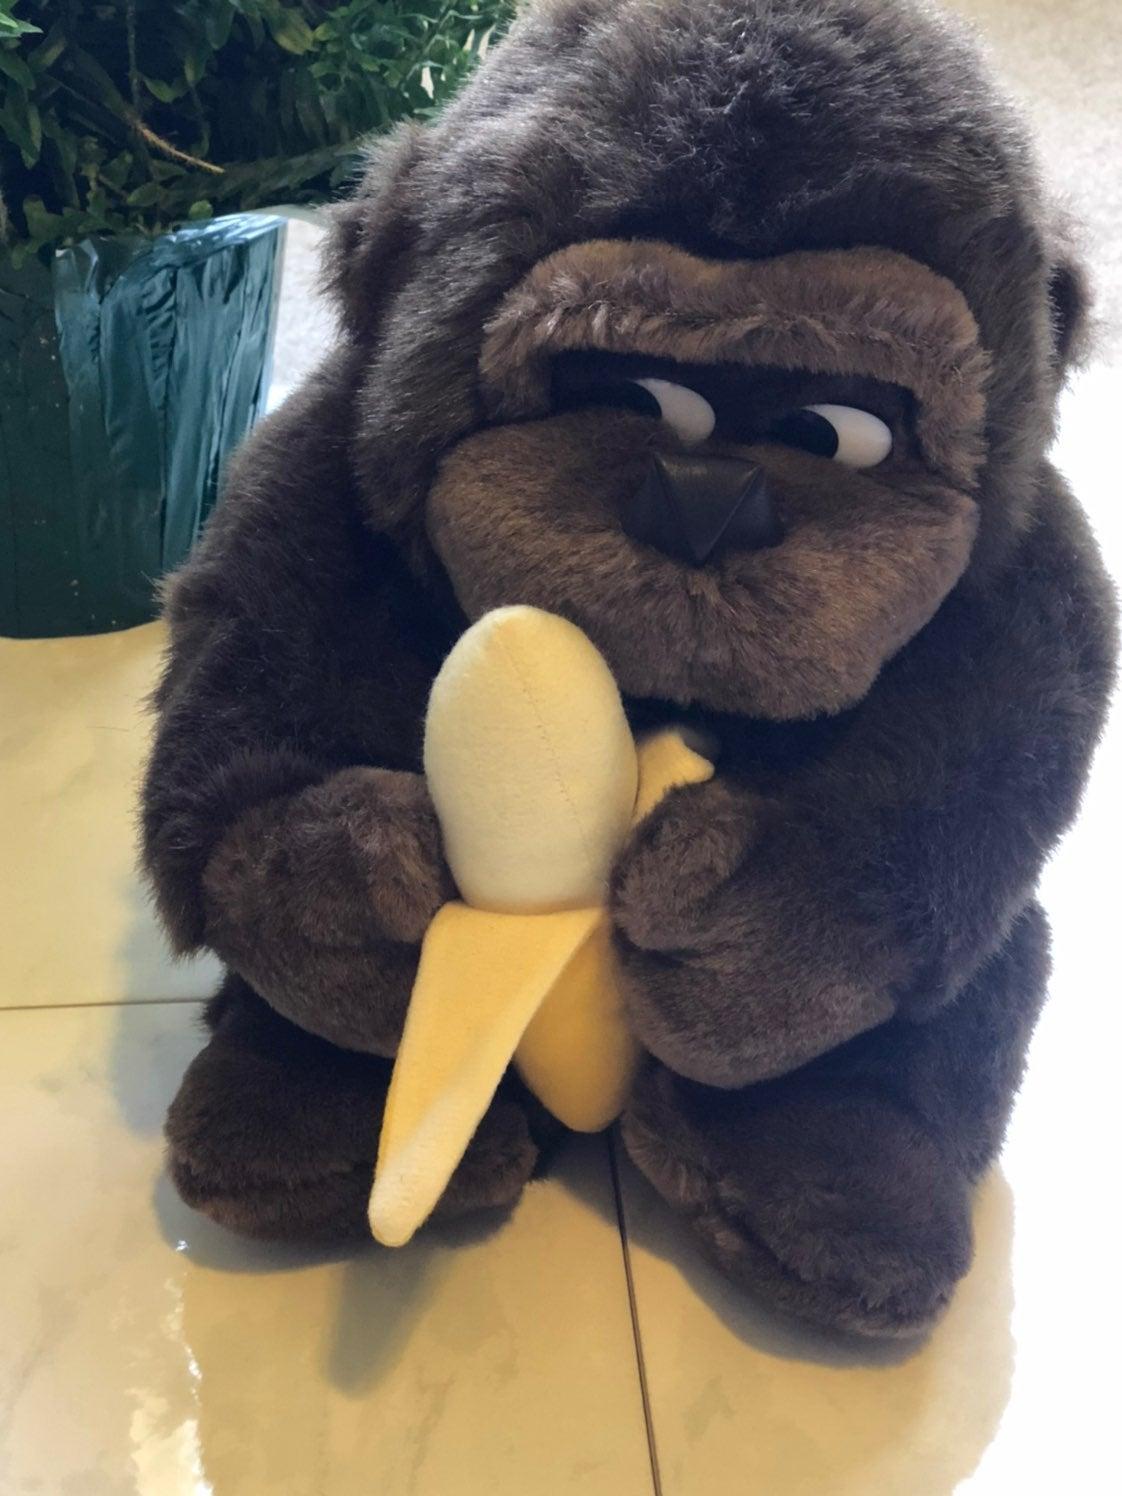 Stuffed animal gorilla